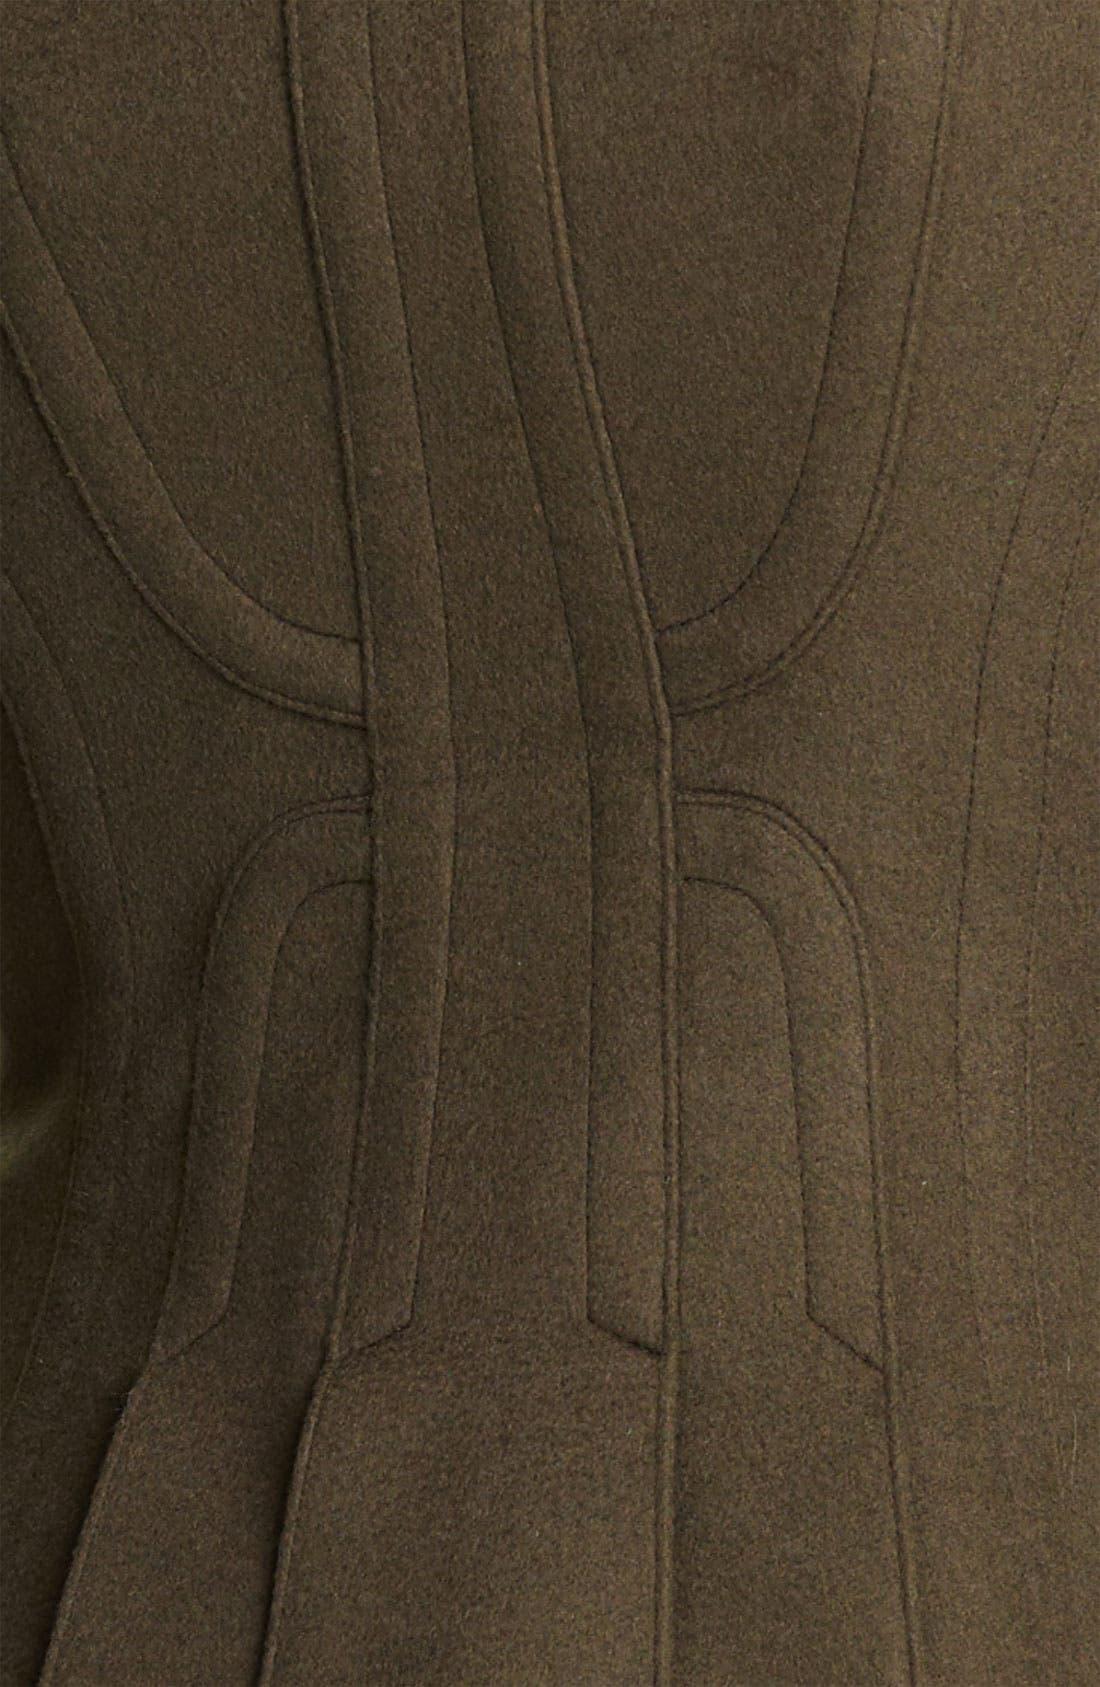 Alternate Image 3  - Burberry Prorsum Wool & Cashmere Coat